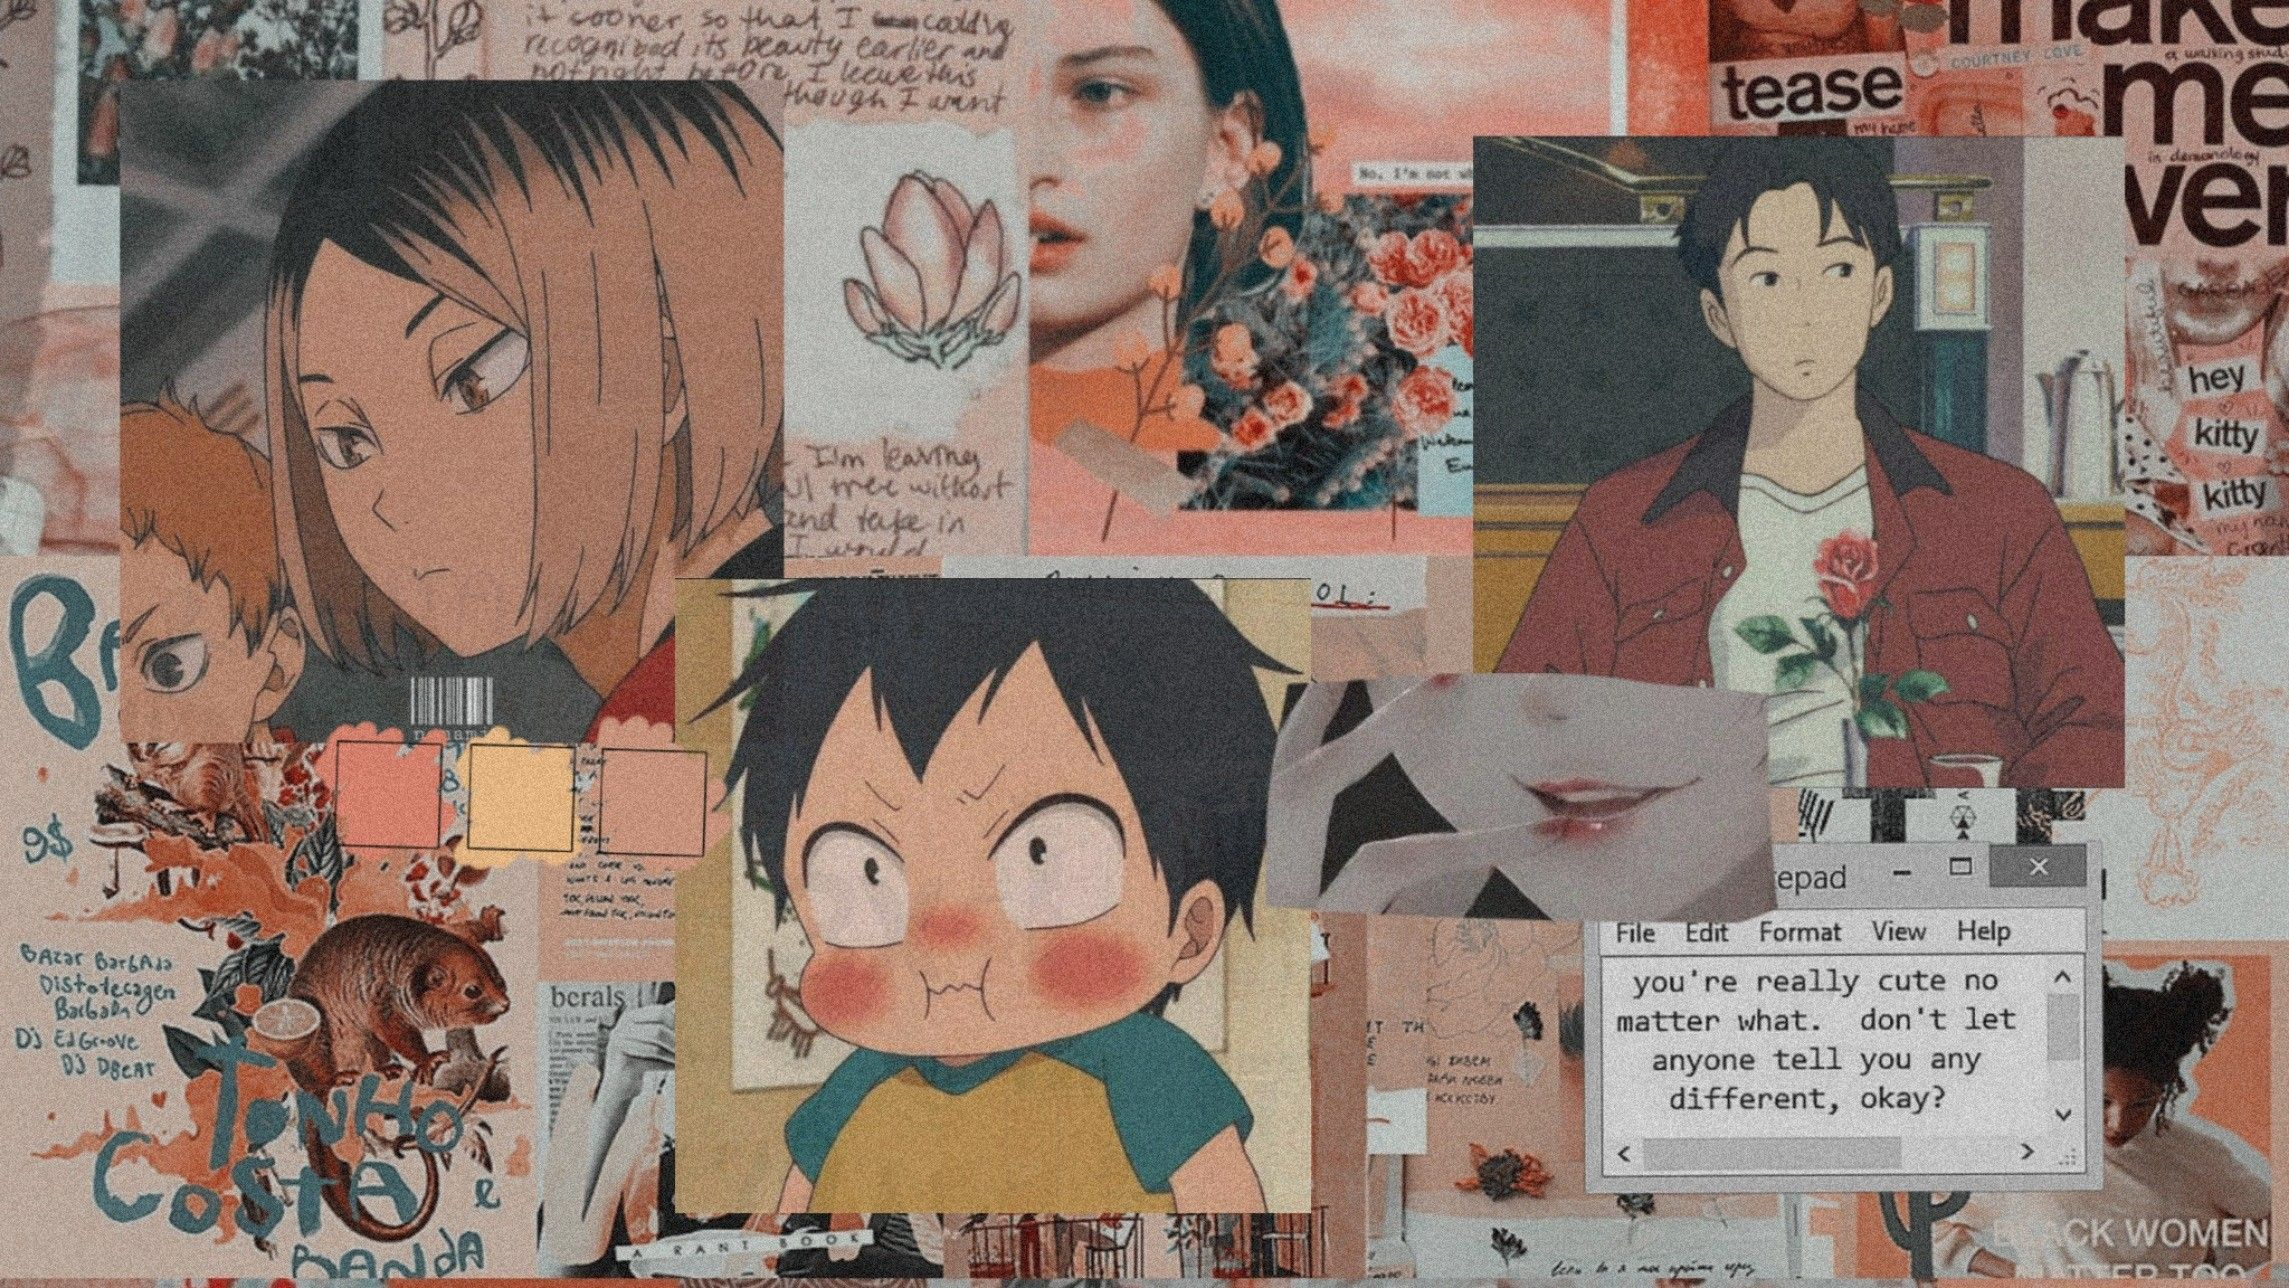 Pin By Belaaang Hakdogg On Minne Cute Desktop Wallpaper Cute Laptop Wallpaper Anime Computer Wallpaper